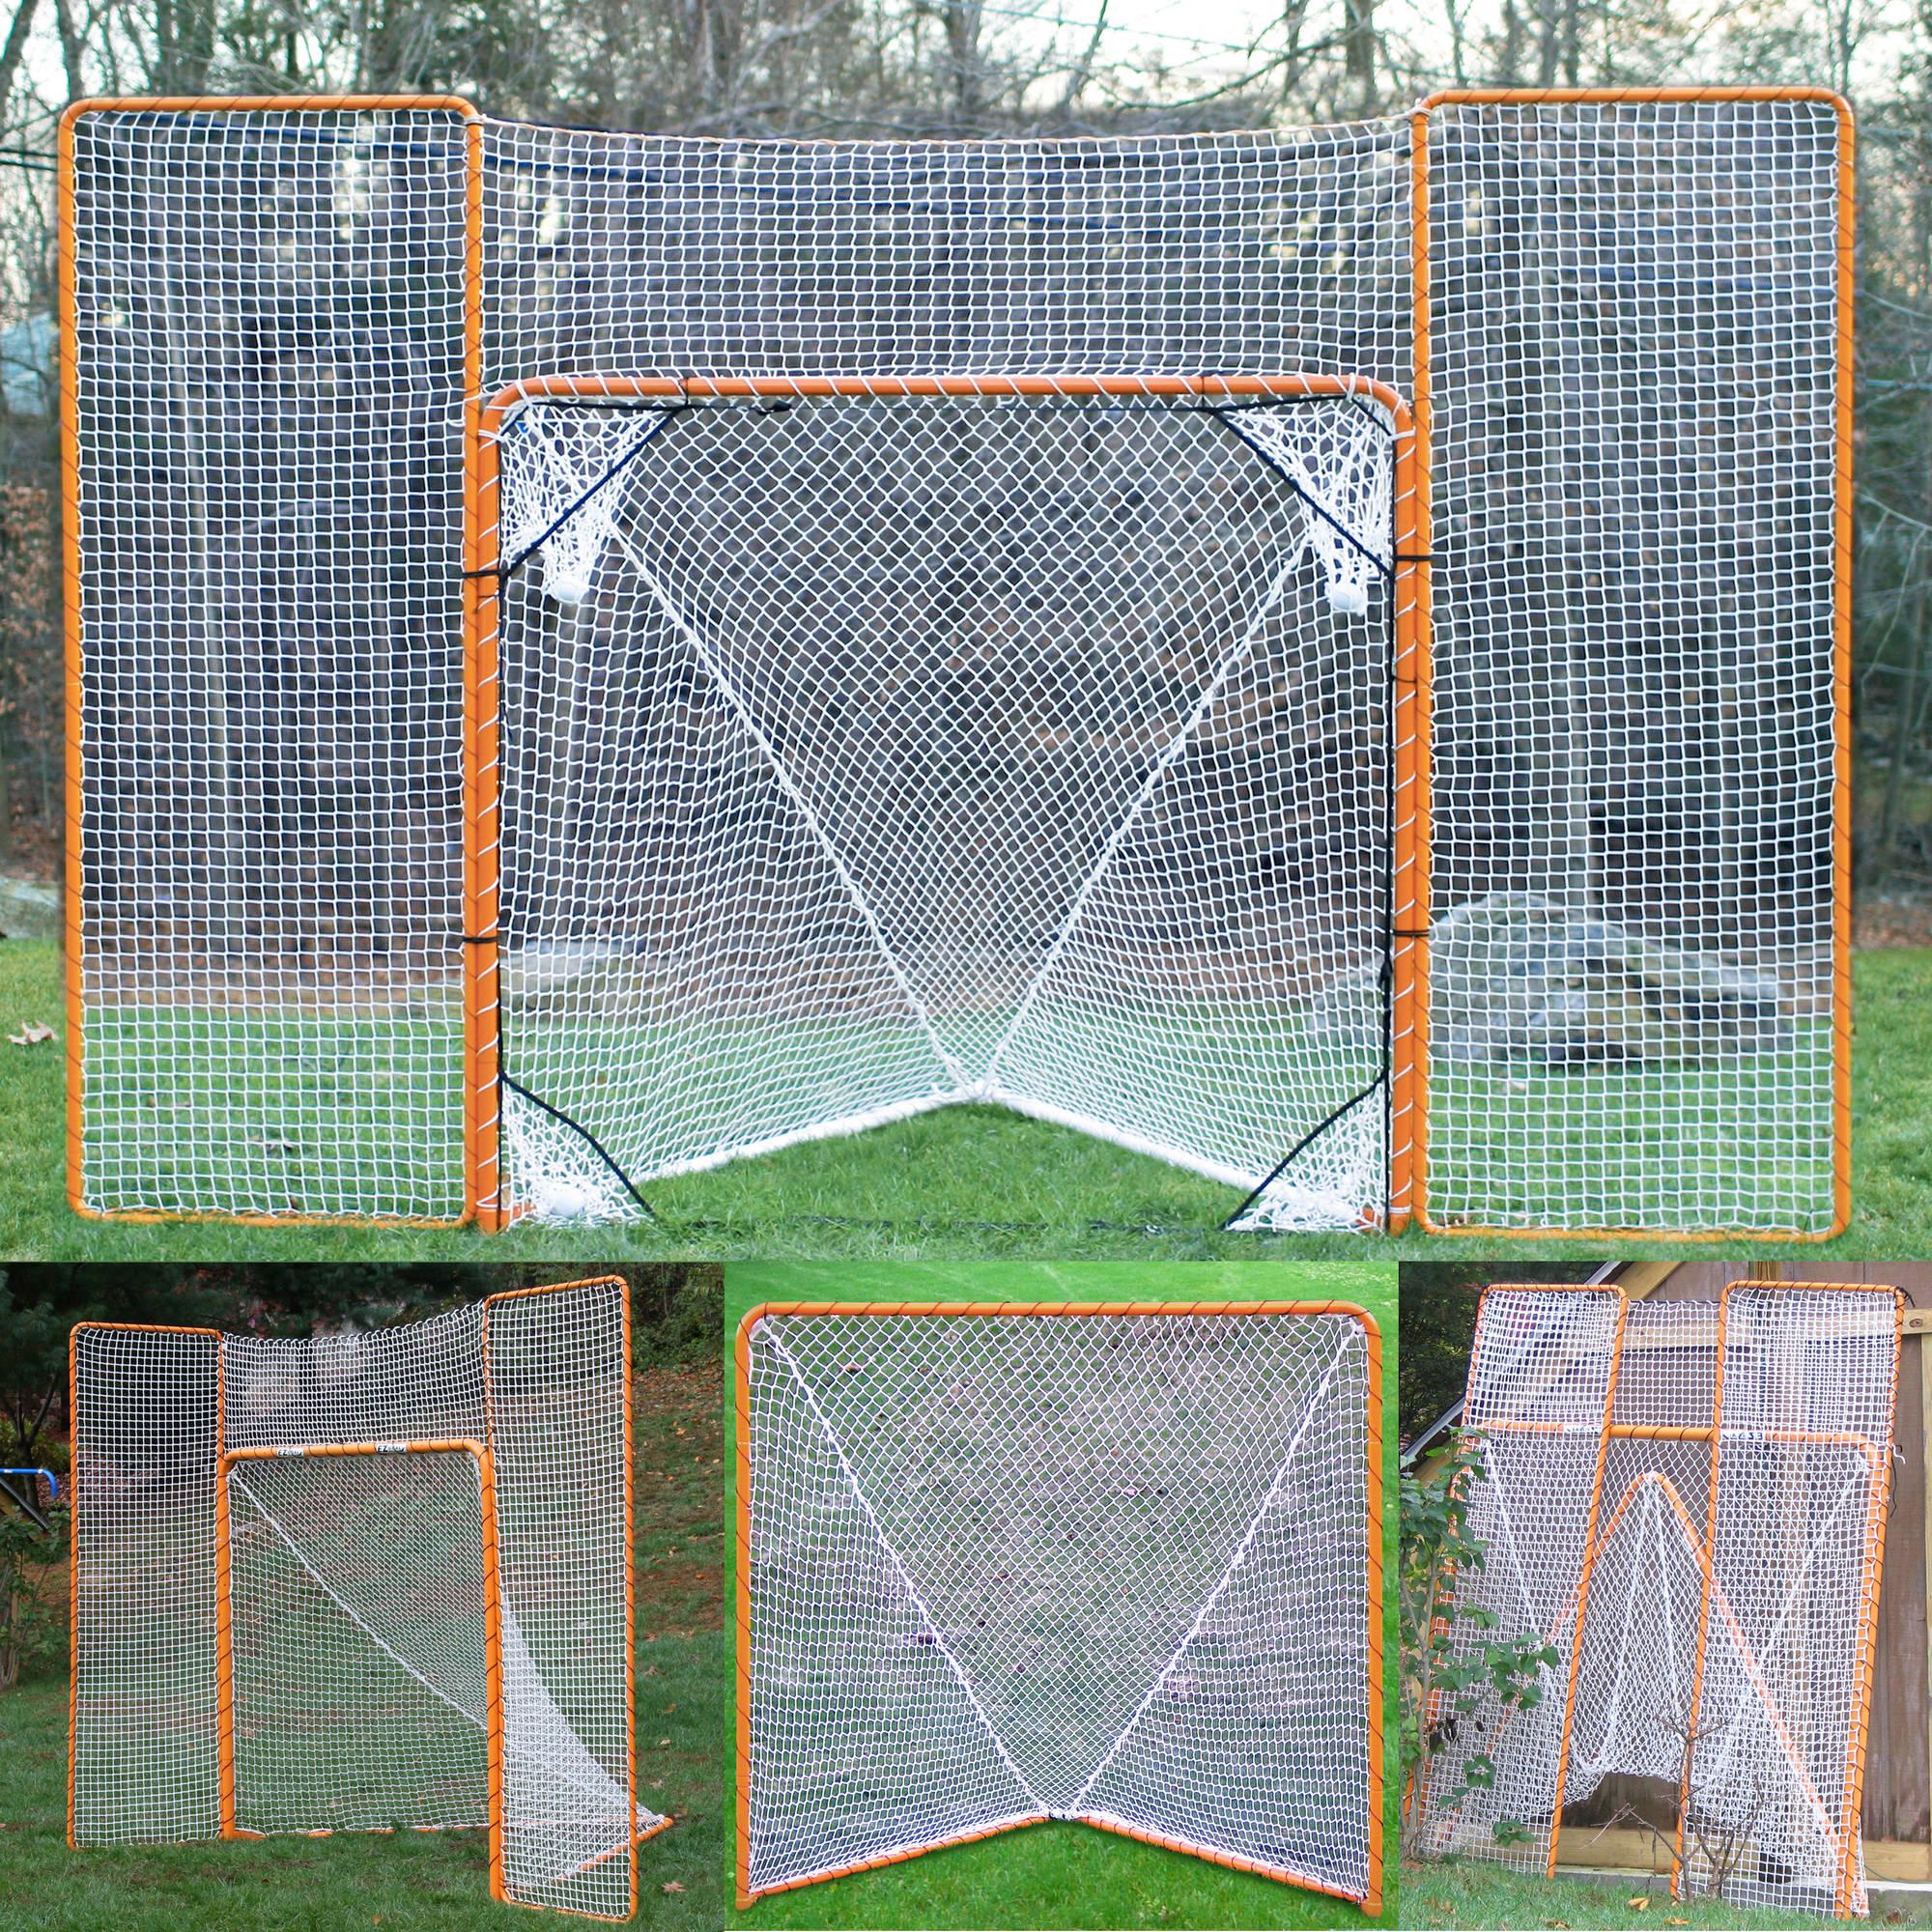 EZgoal Monster 6' x 6' Official Regulation Folding Metal Lacrosse Goal Net with 11' x 8' Backstop Rebounder and 4 Net Pocket Targets